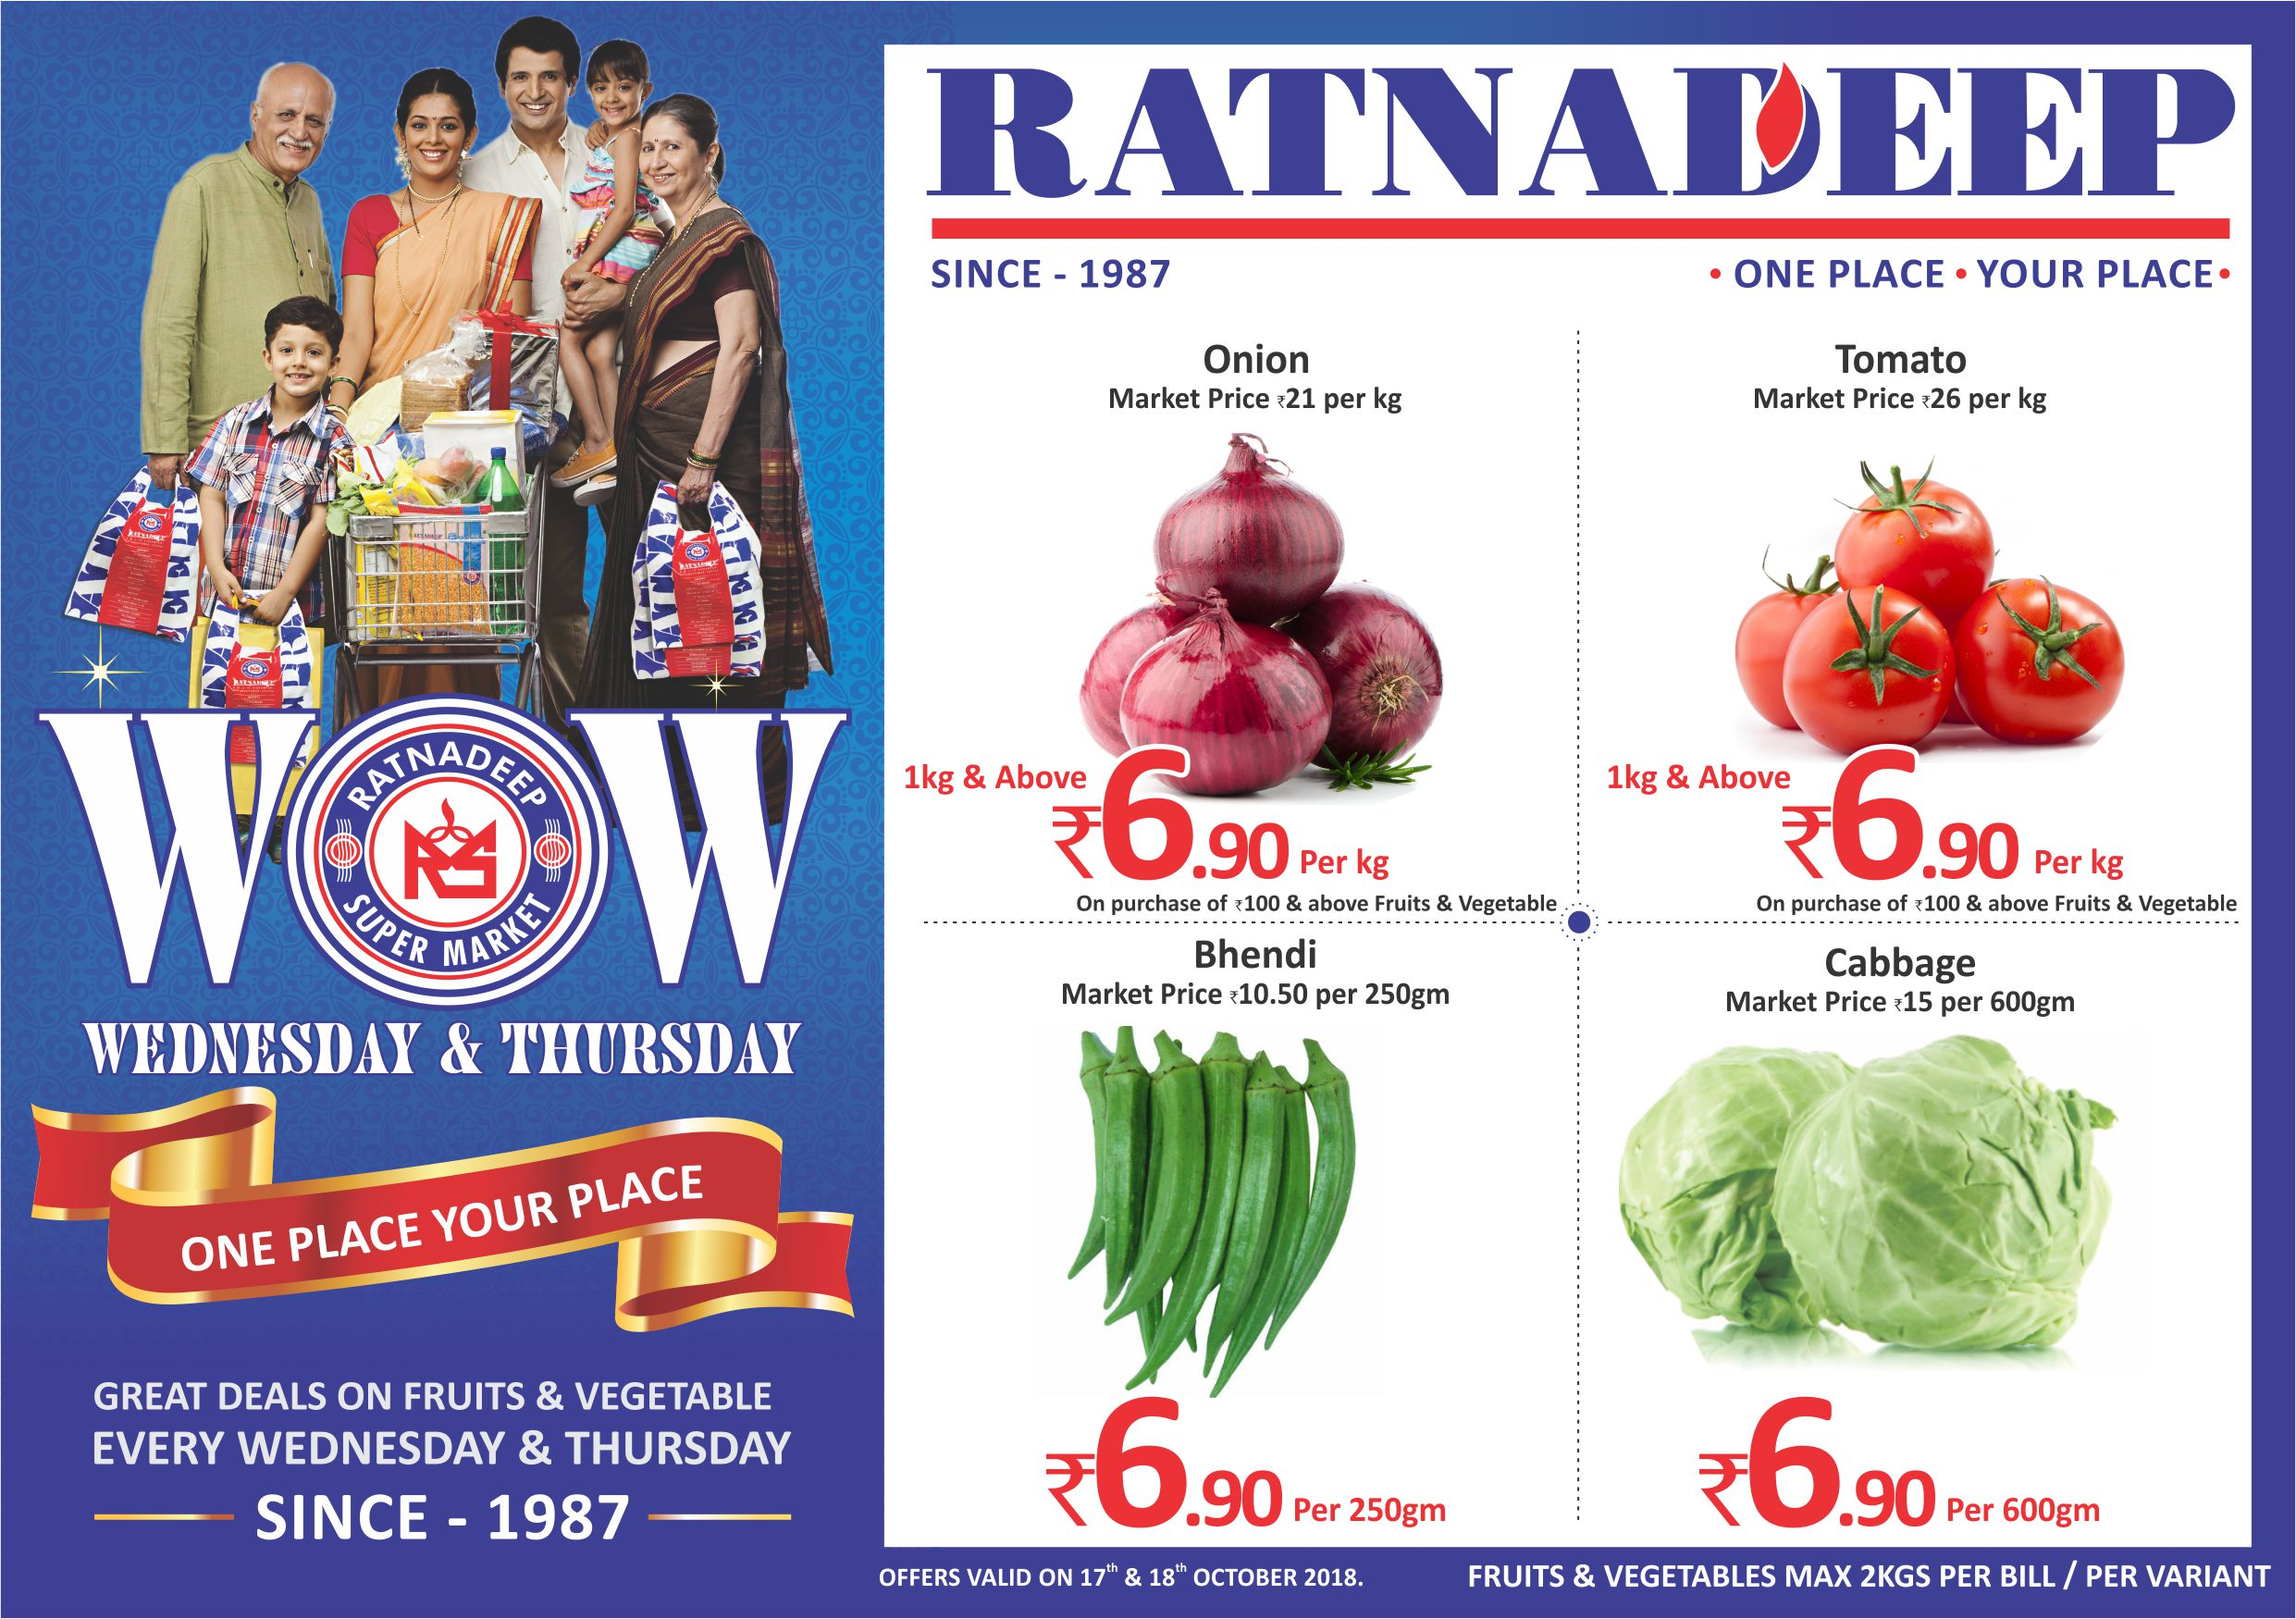 Ratnadeep Wednesday & Thursday Offers